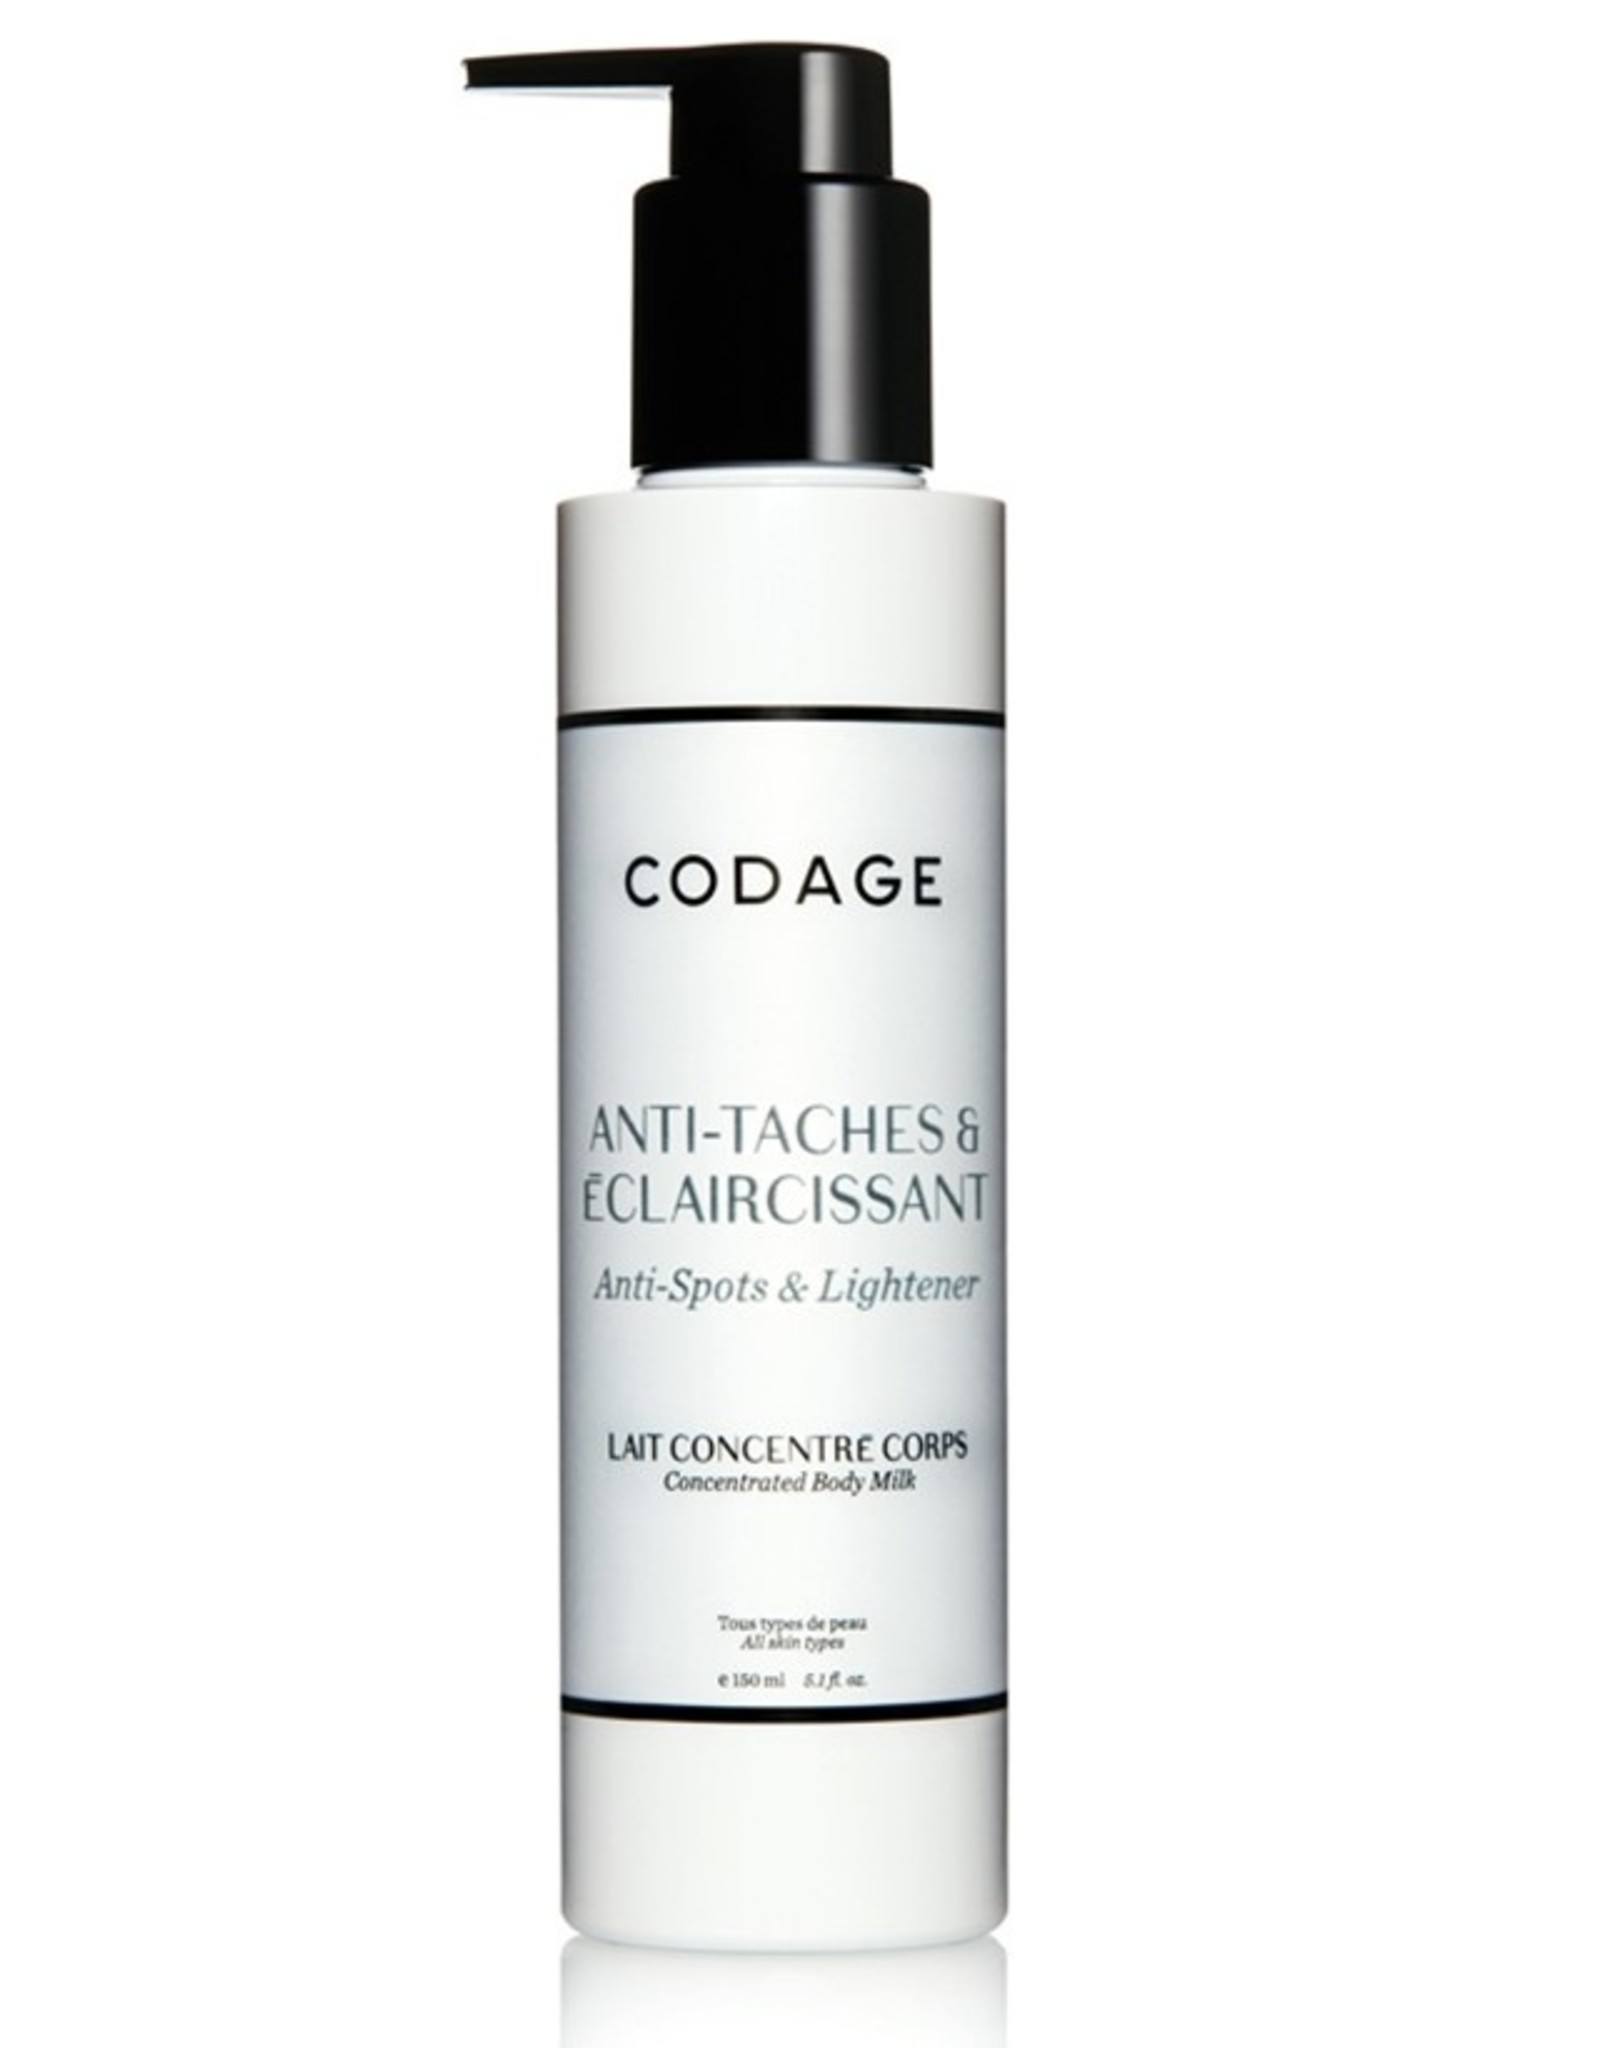 Codage Paris CODAGE PARIS  CONCENTRATED BODY MILK - Anti-Spots & Lightener 150ML